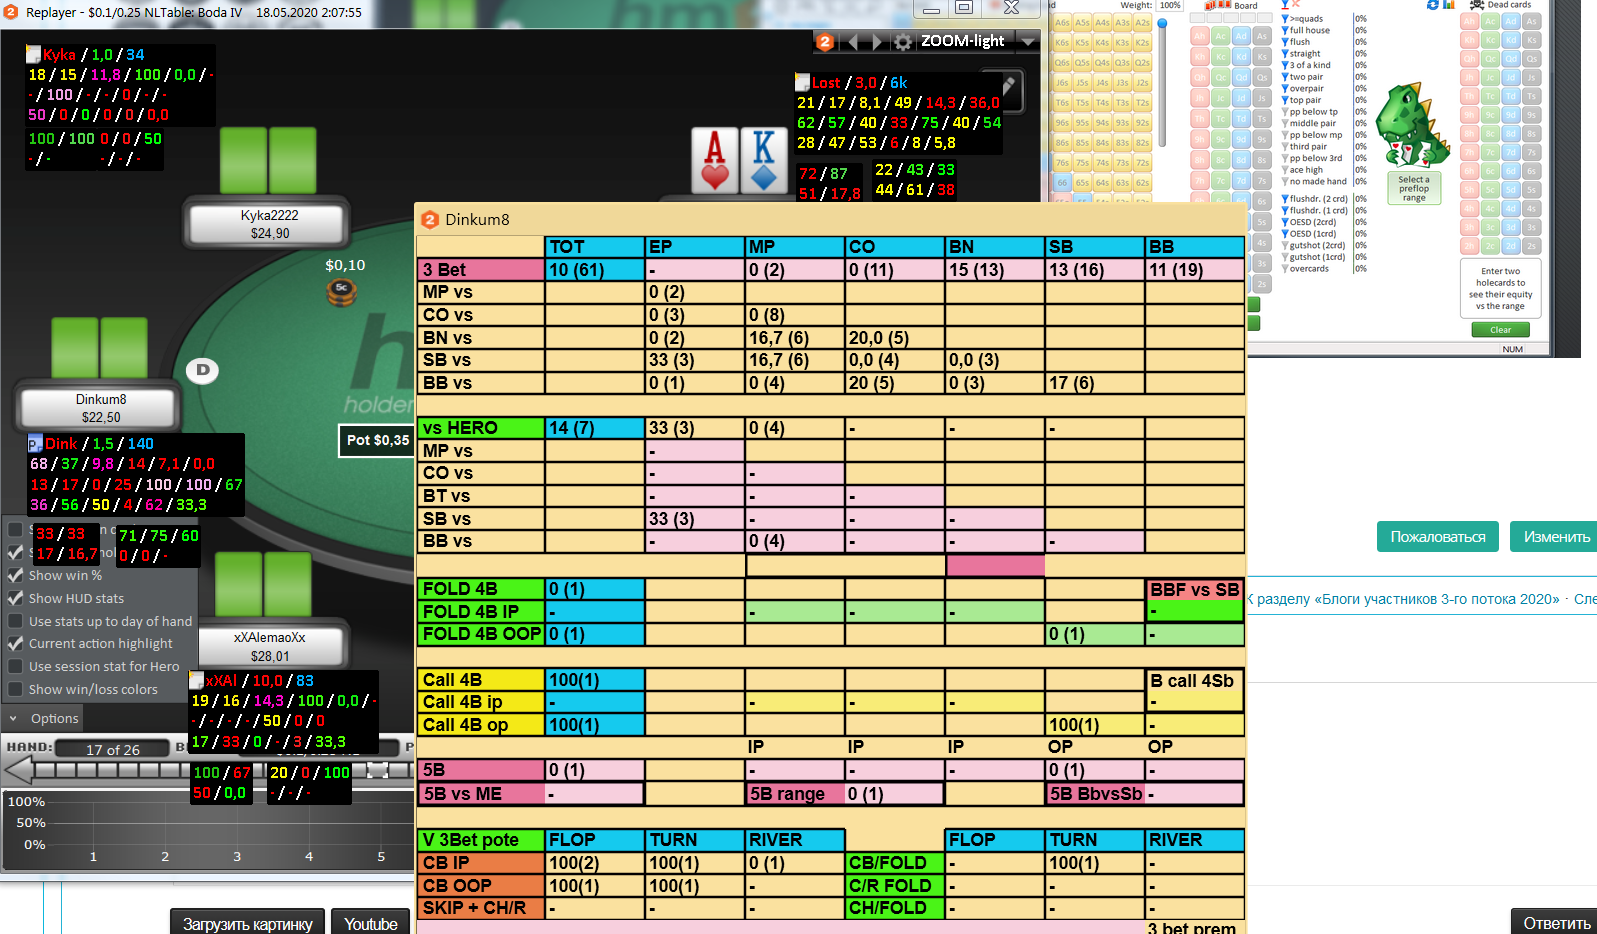 screenshot11589803445.png